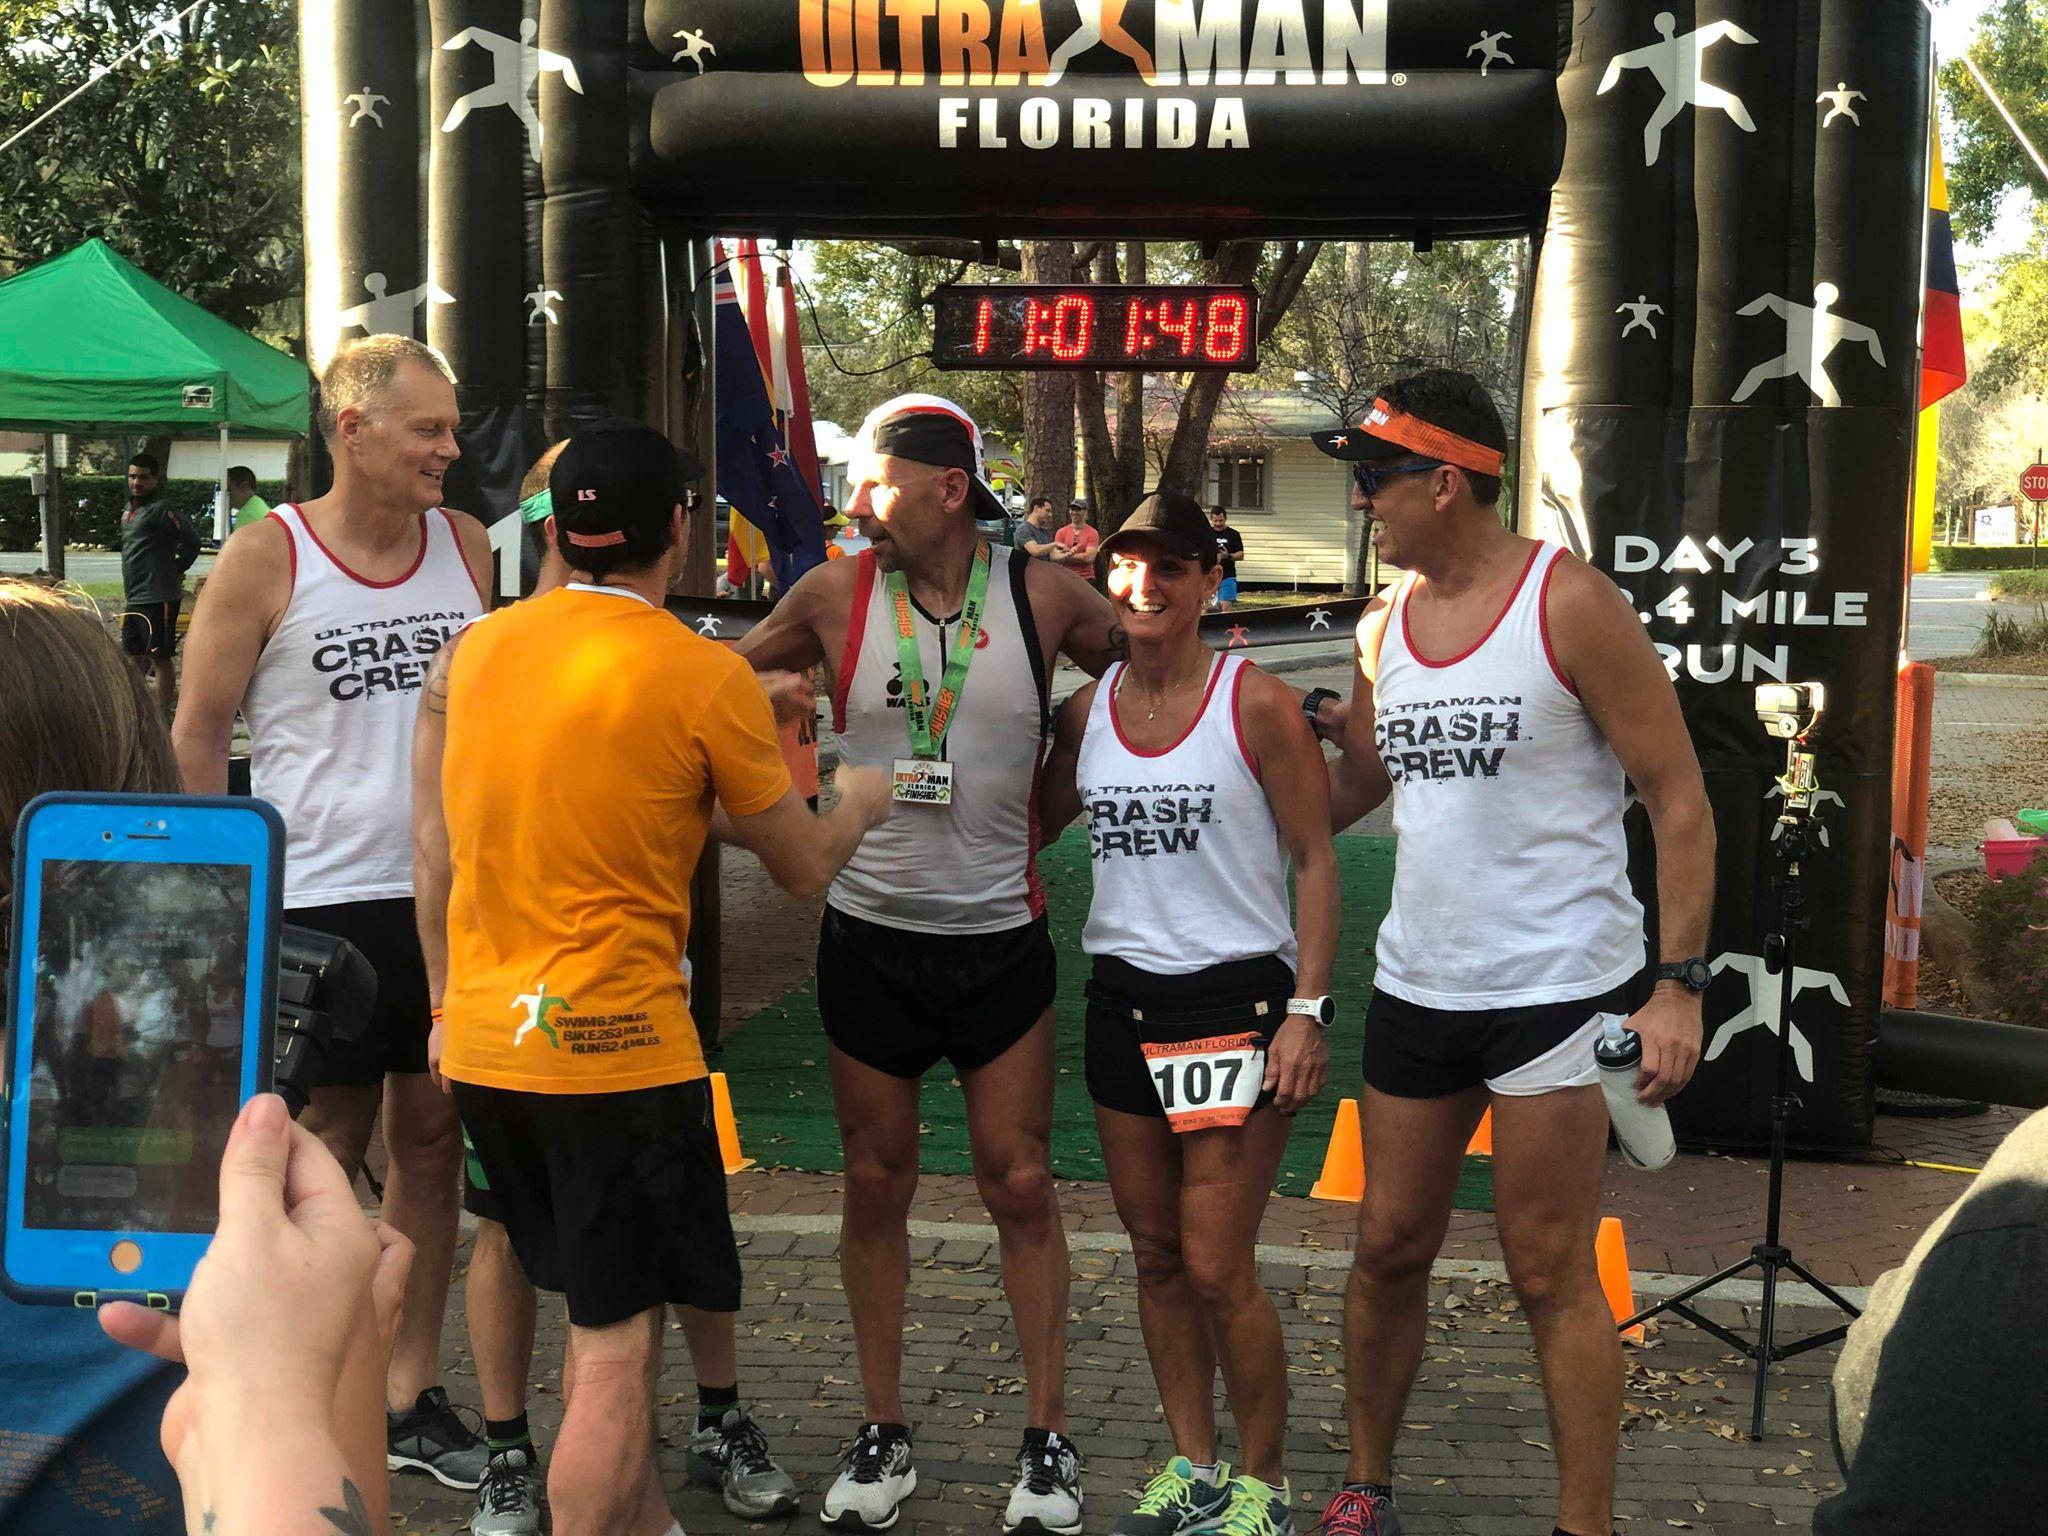 Coach_Terry_Wilson_Pursuit_of_The_Perfect_Race_Ultraman_Florida_Chris_Pollack_Finish_1.jpg